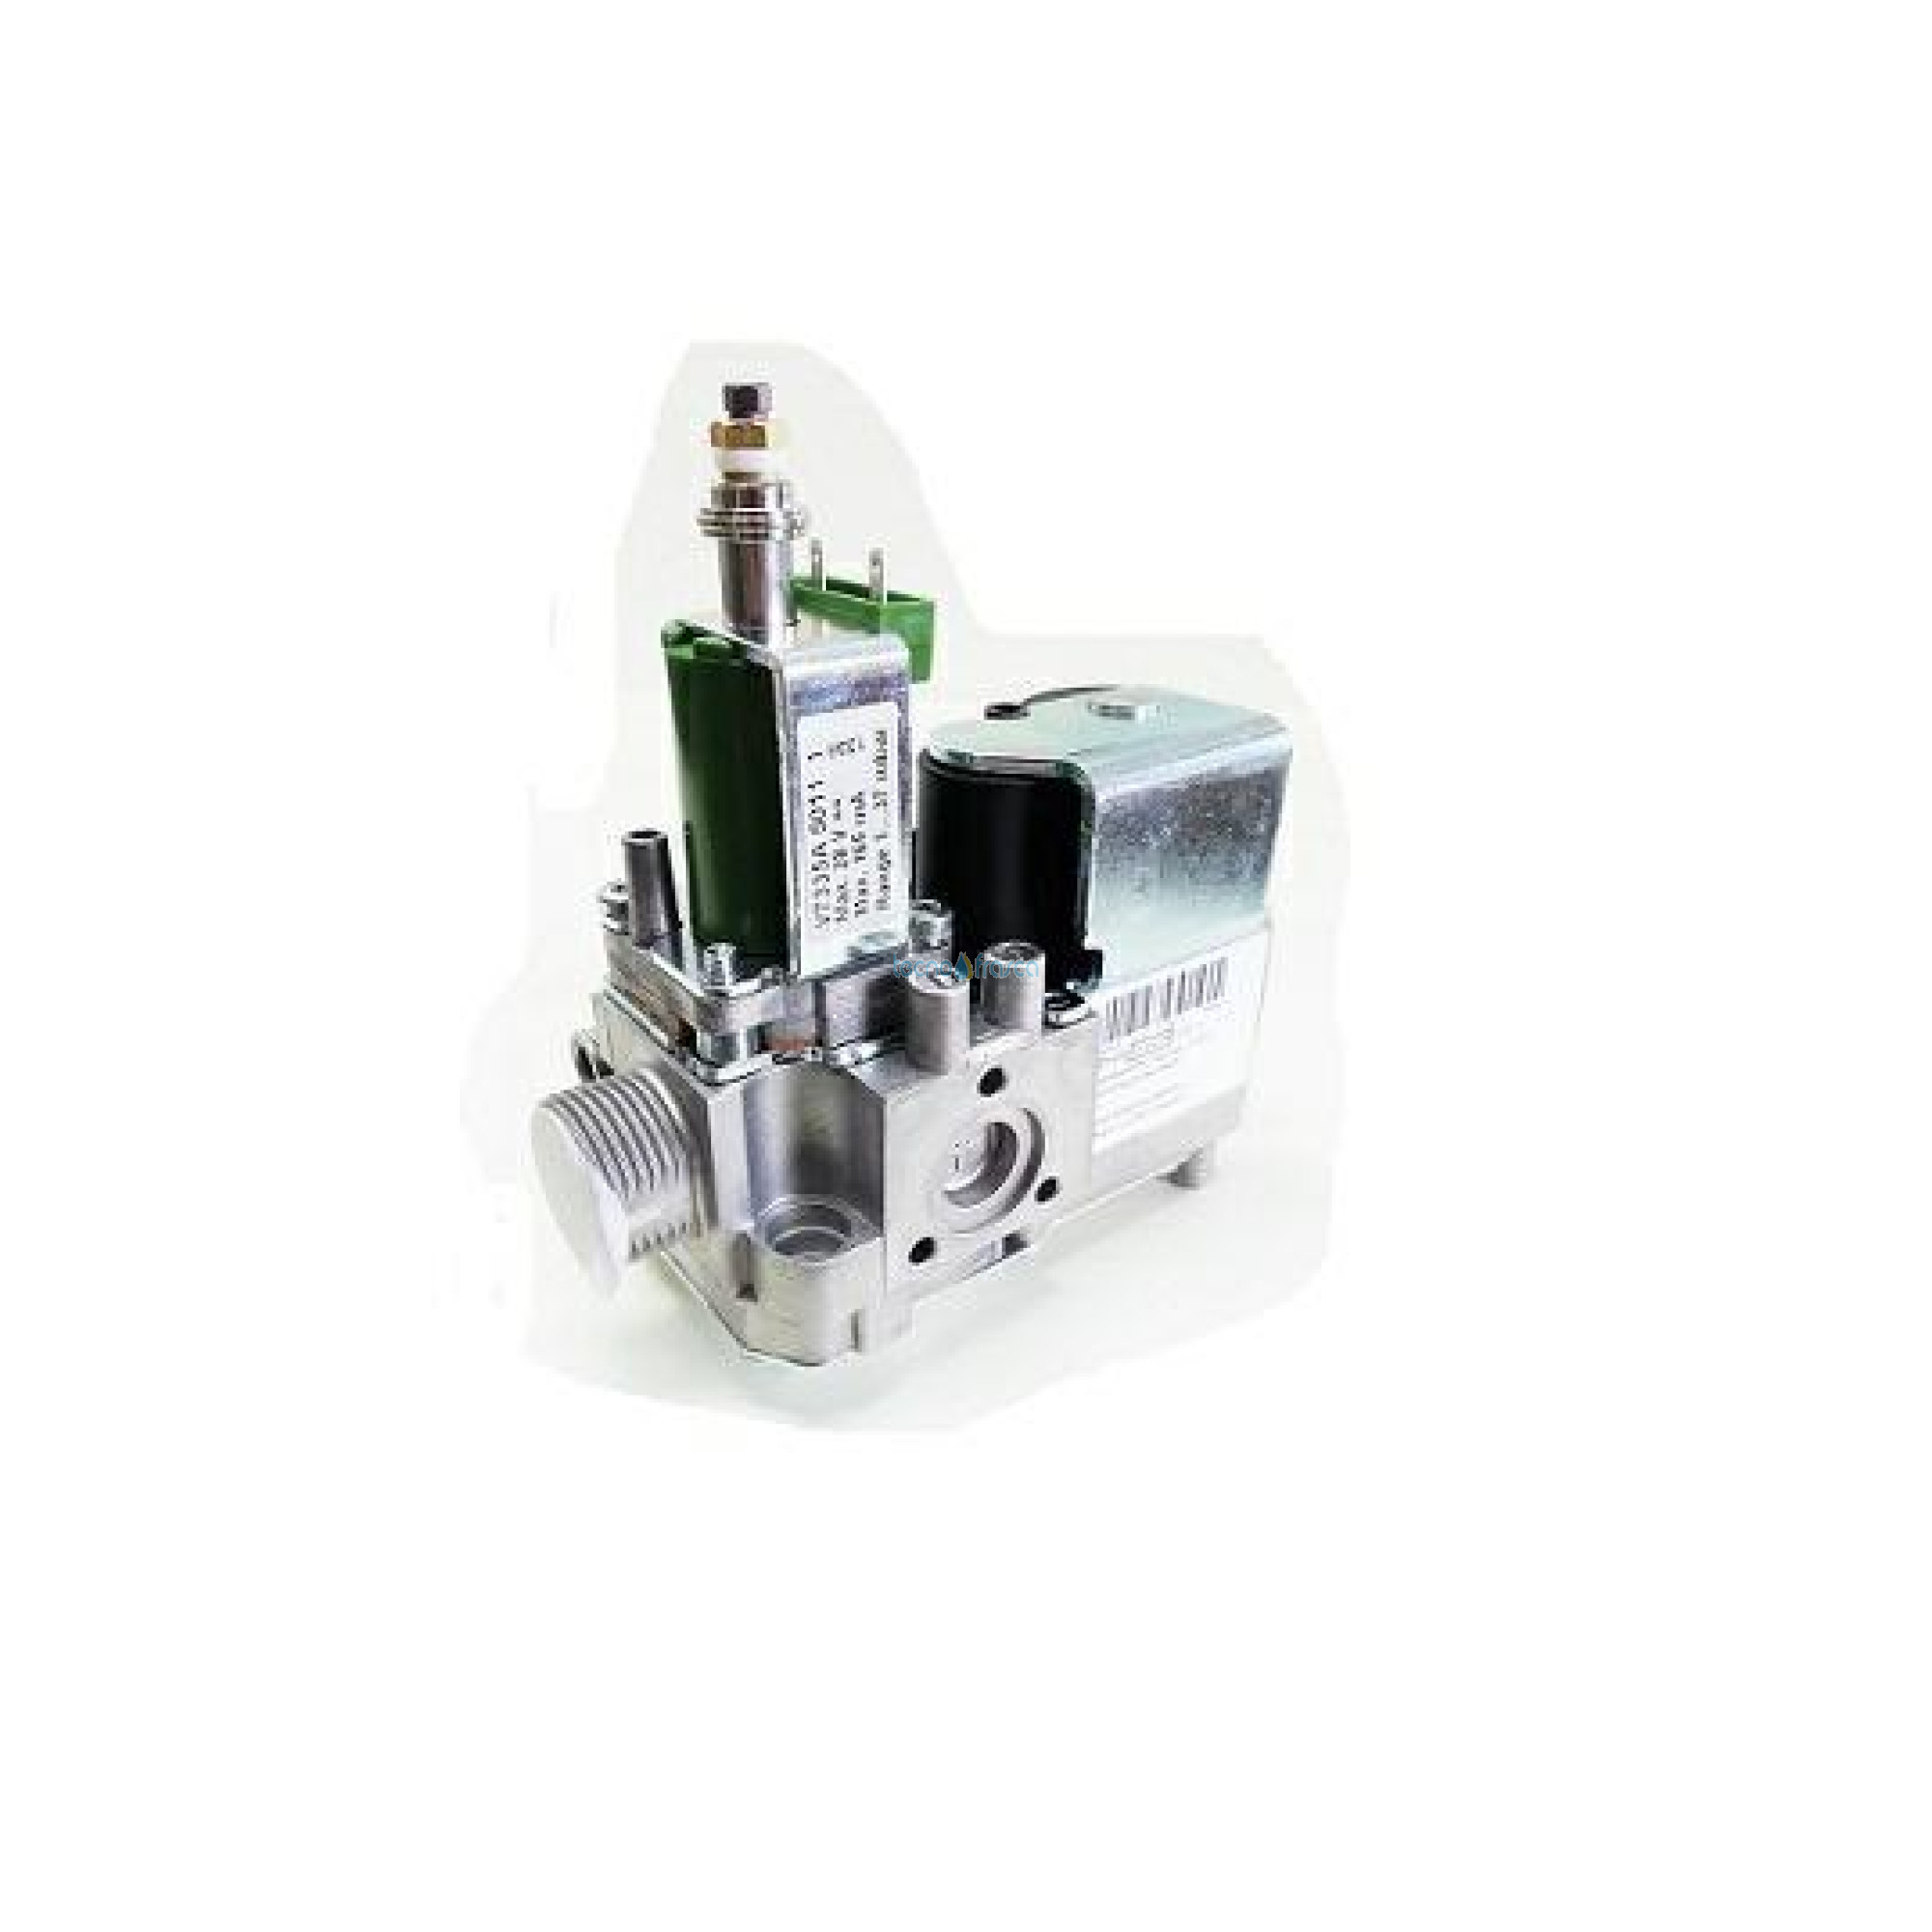 Ariston valvola gas honeywell vk4105m5041 65100244